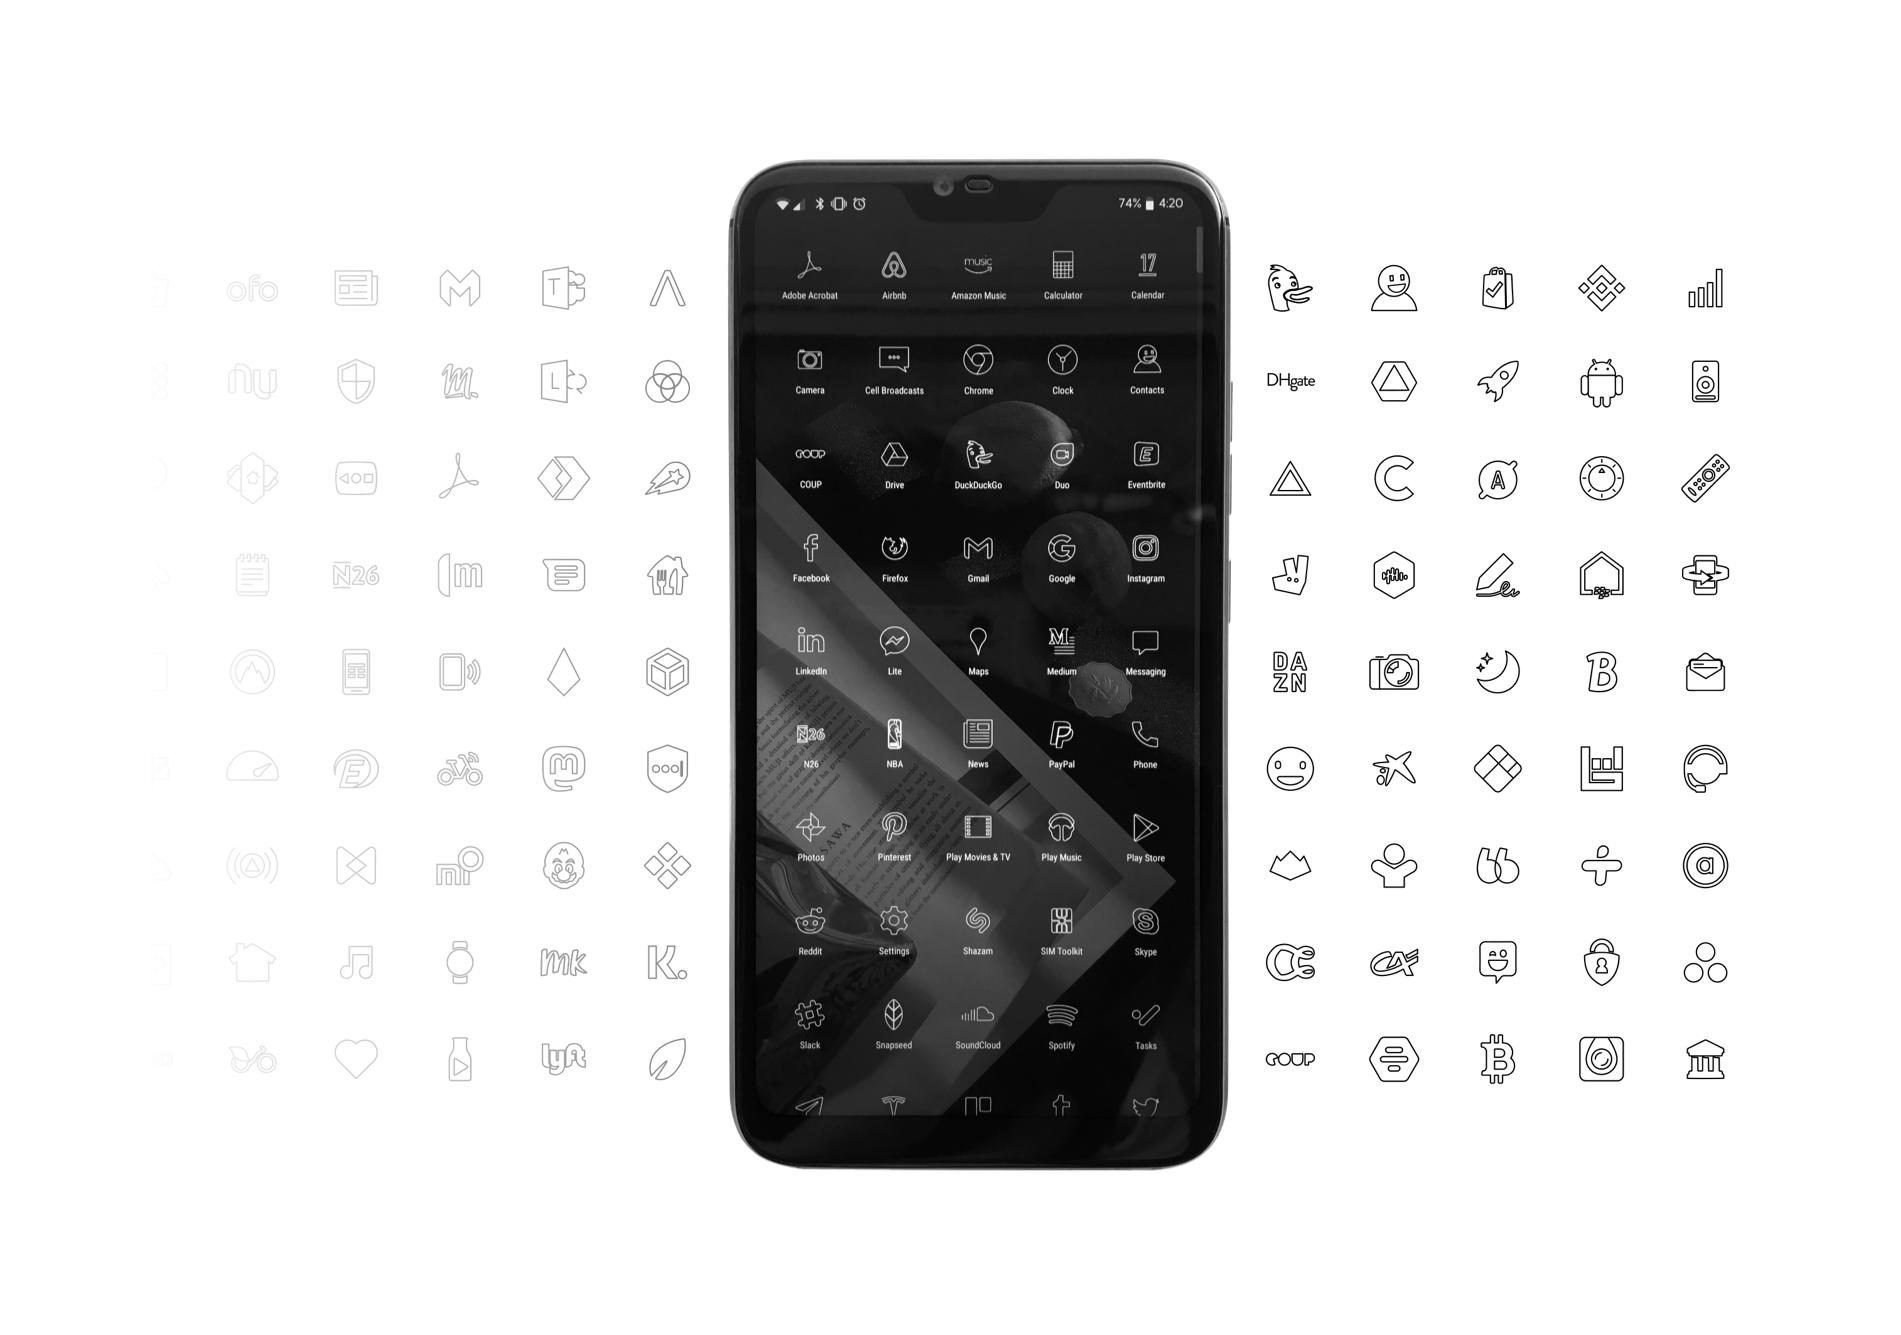 Minimalistische smartphone Blloc